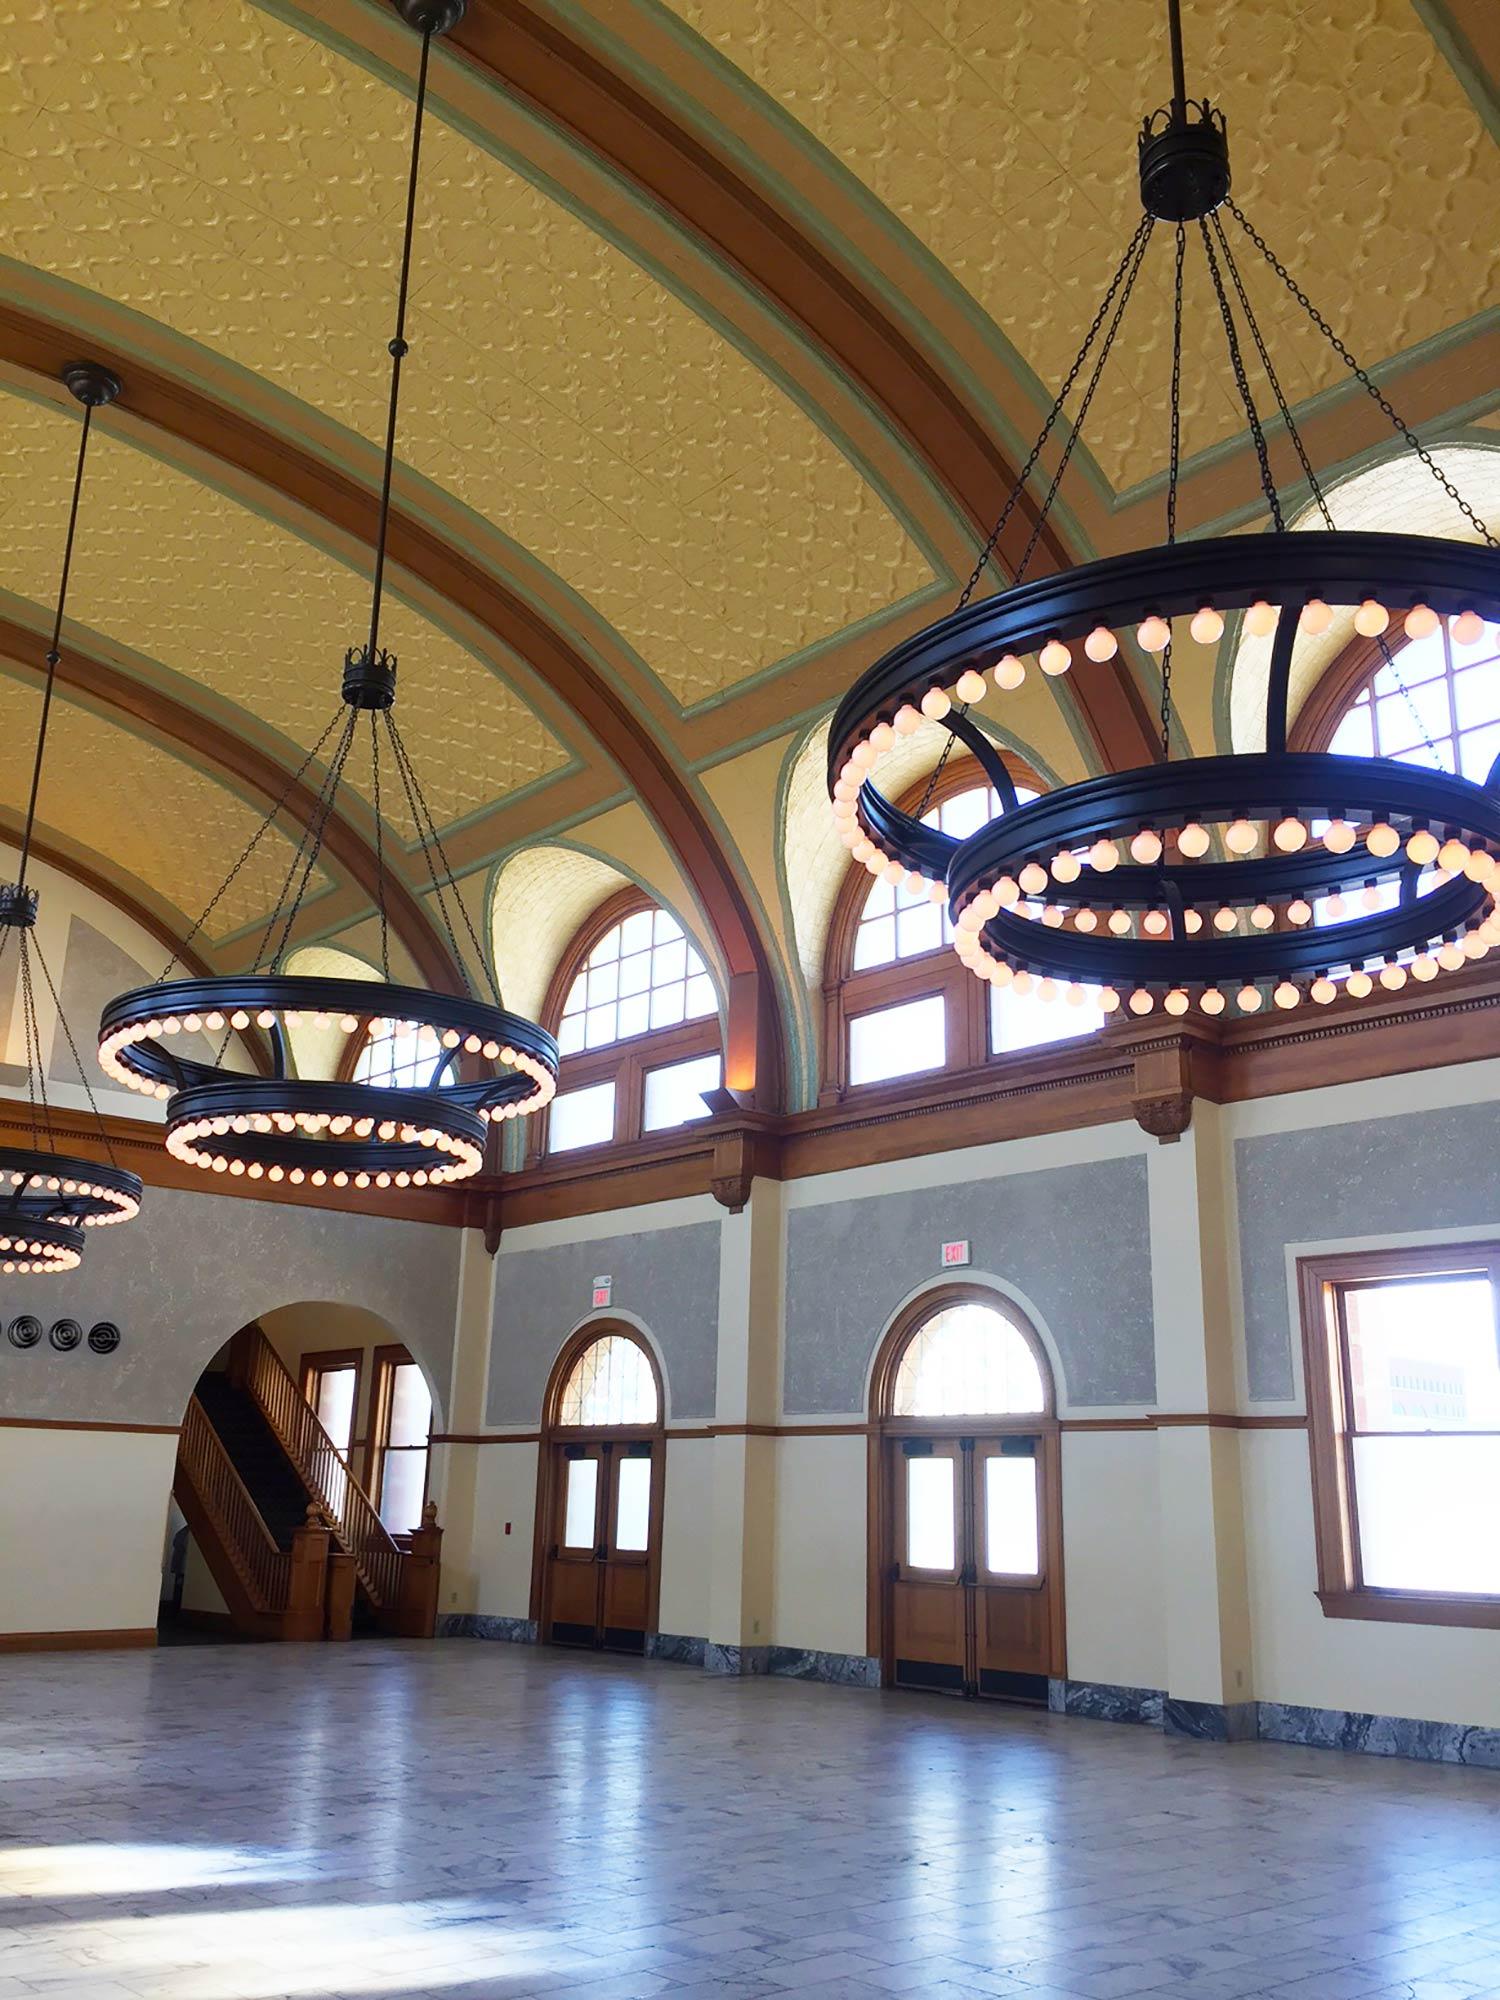 Fort worth wedding venue Ashton Depot large chandeliers